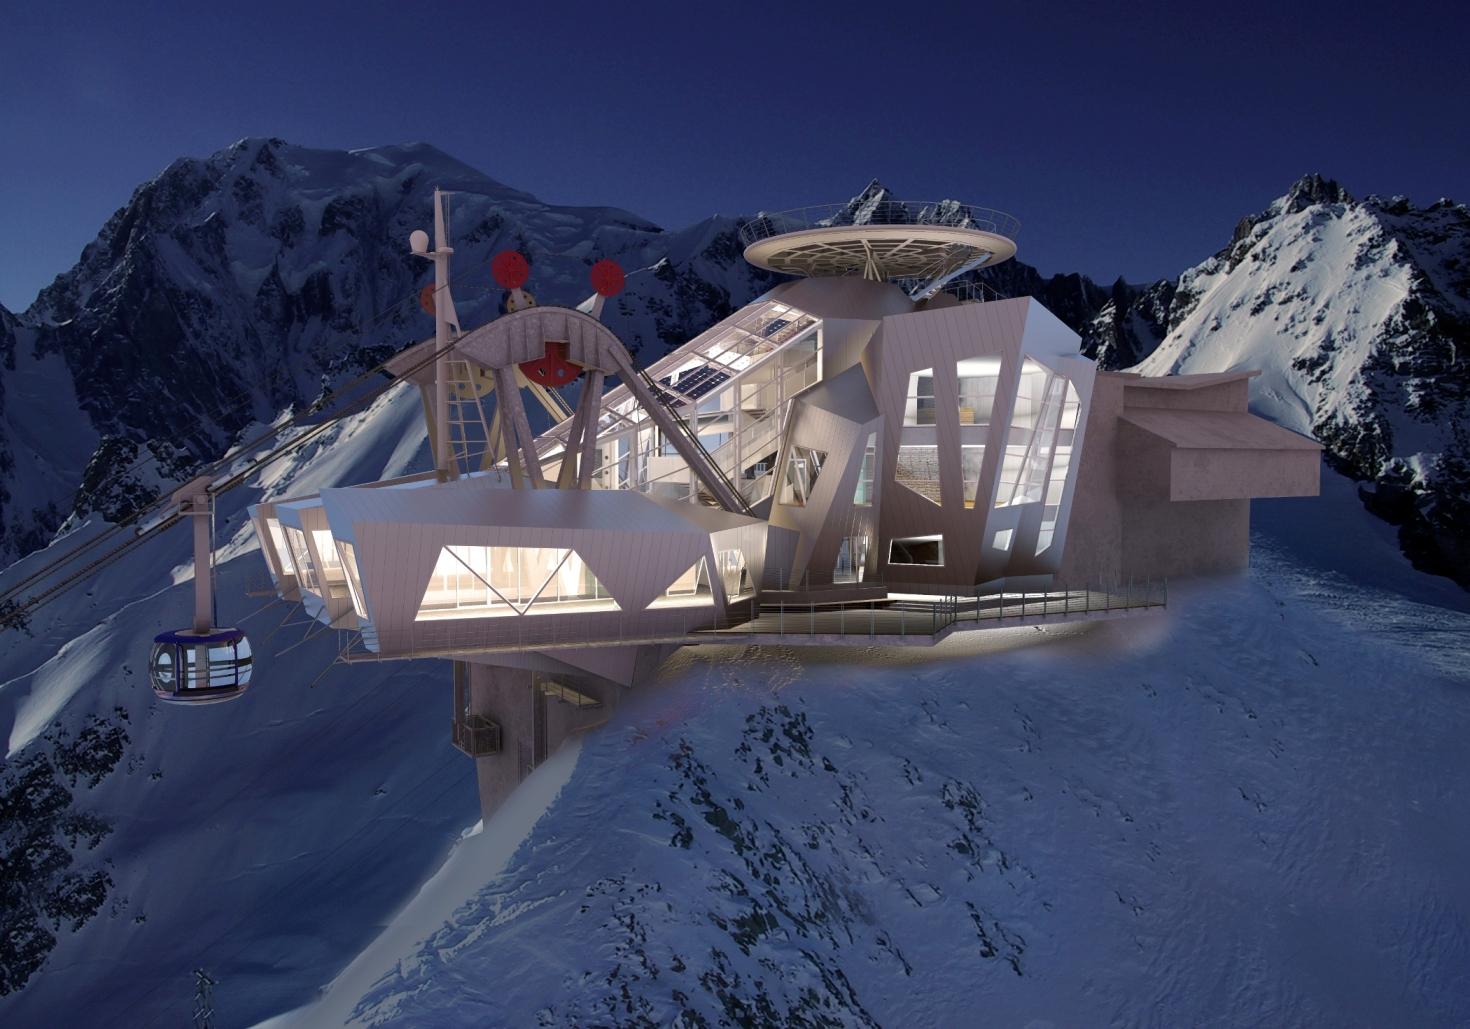 L'arrivo della funivia Skyway Monte Bianco